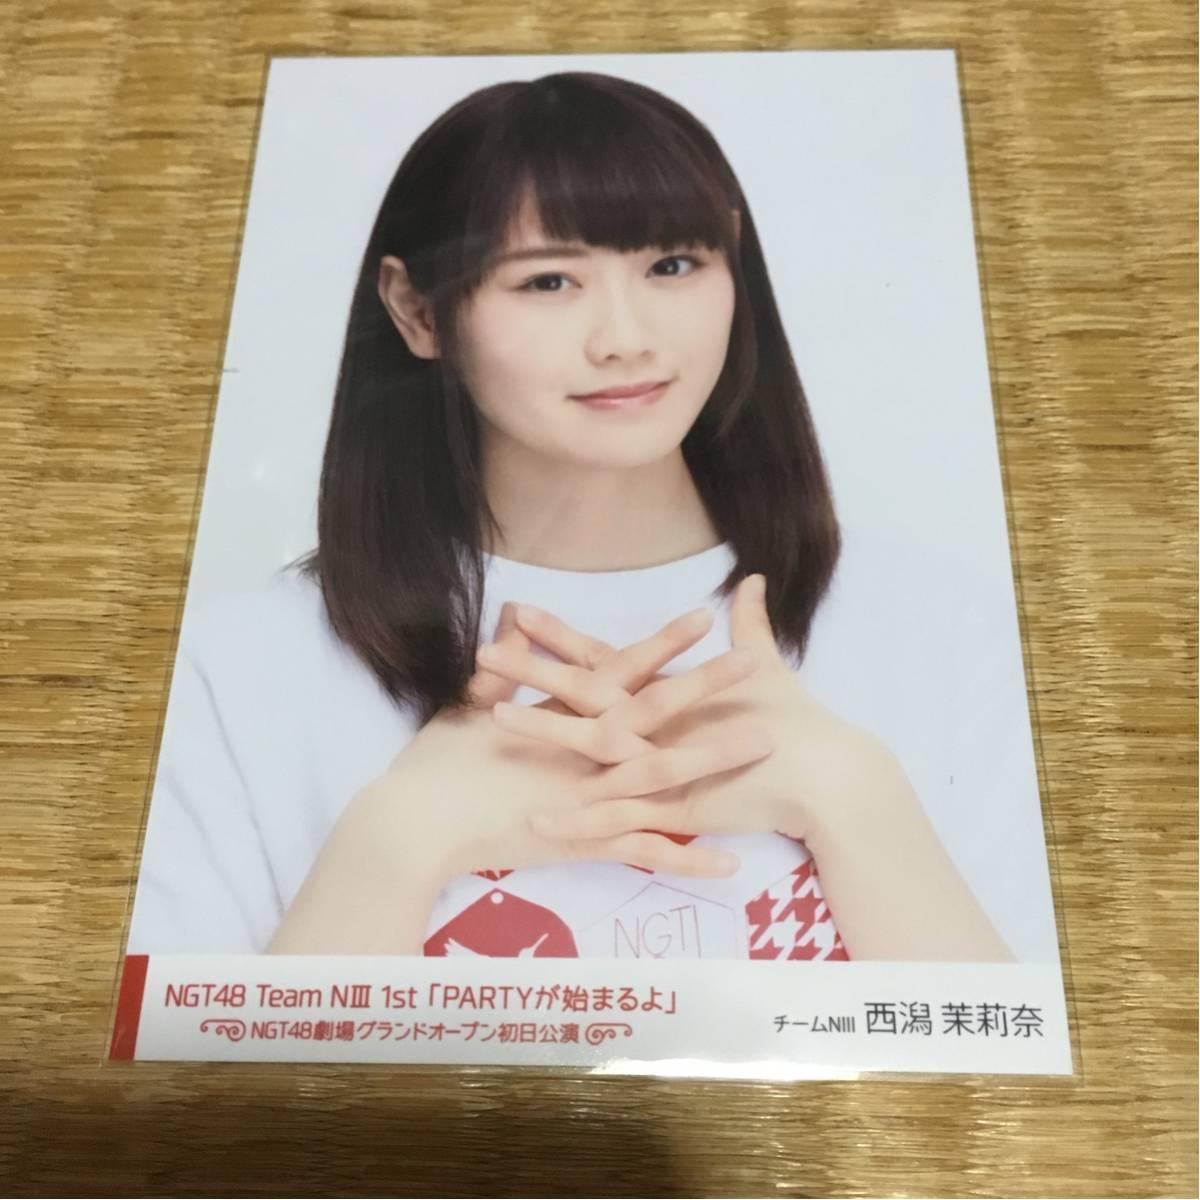 NGT48 西潟茉莉奈 生写真 NGT48劇場グランドオープン初日公演「PARTYが始まるよ」DVD封入特典 ライブグッズの画像